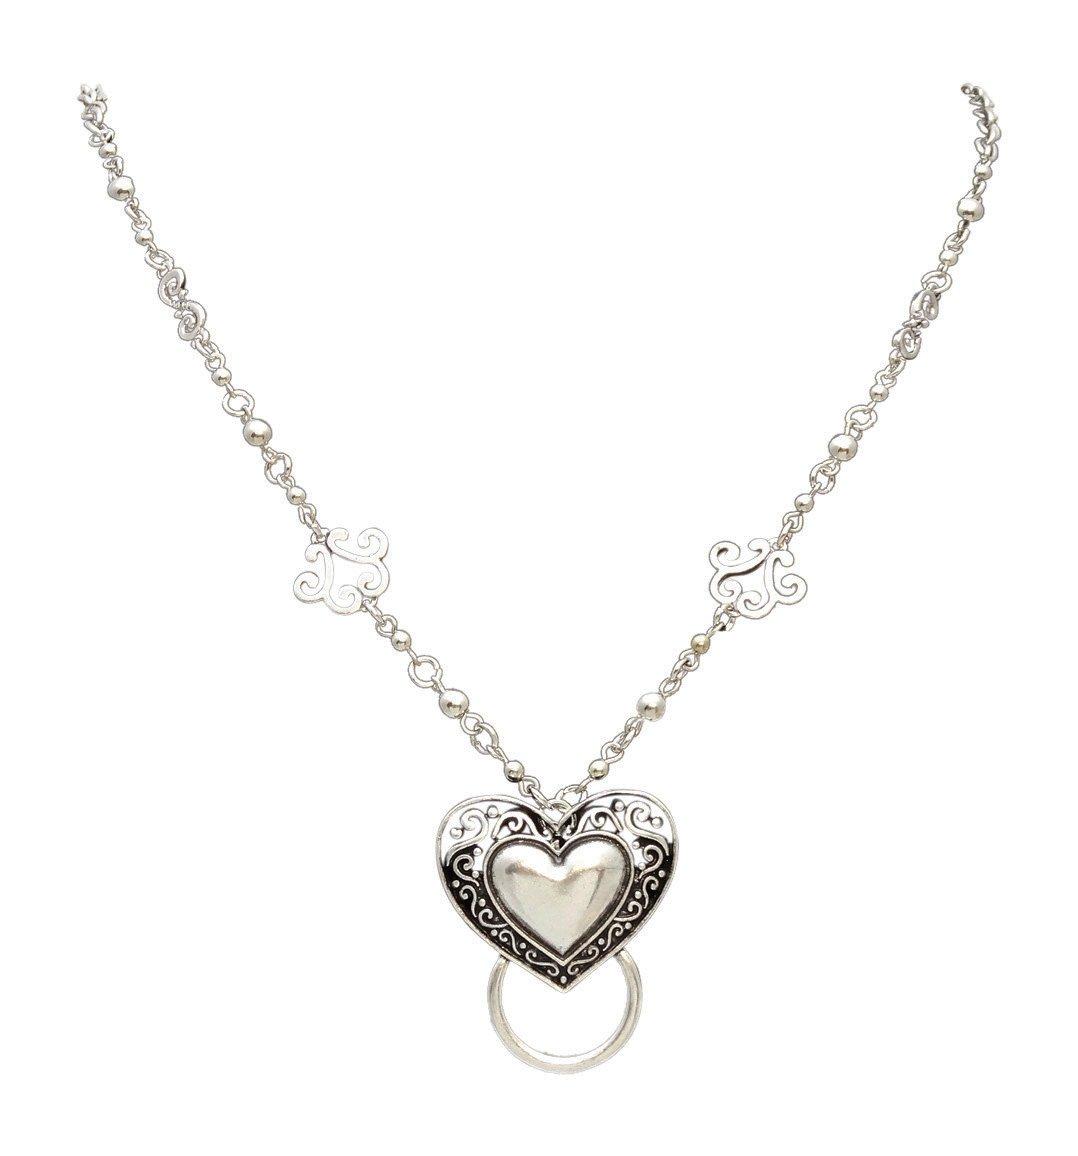 New Eyeglass / Id Badge Holder Necklace Lanyard with Ornate Heart Pendant